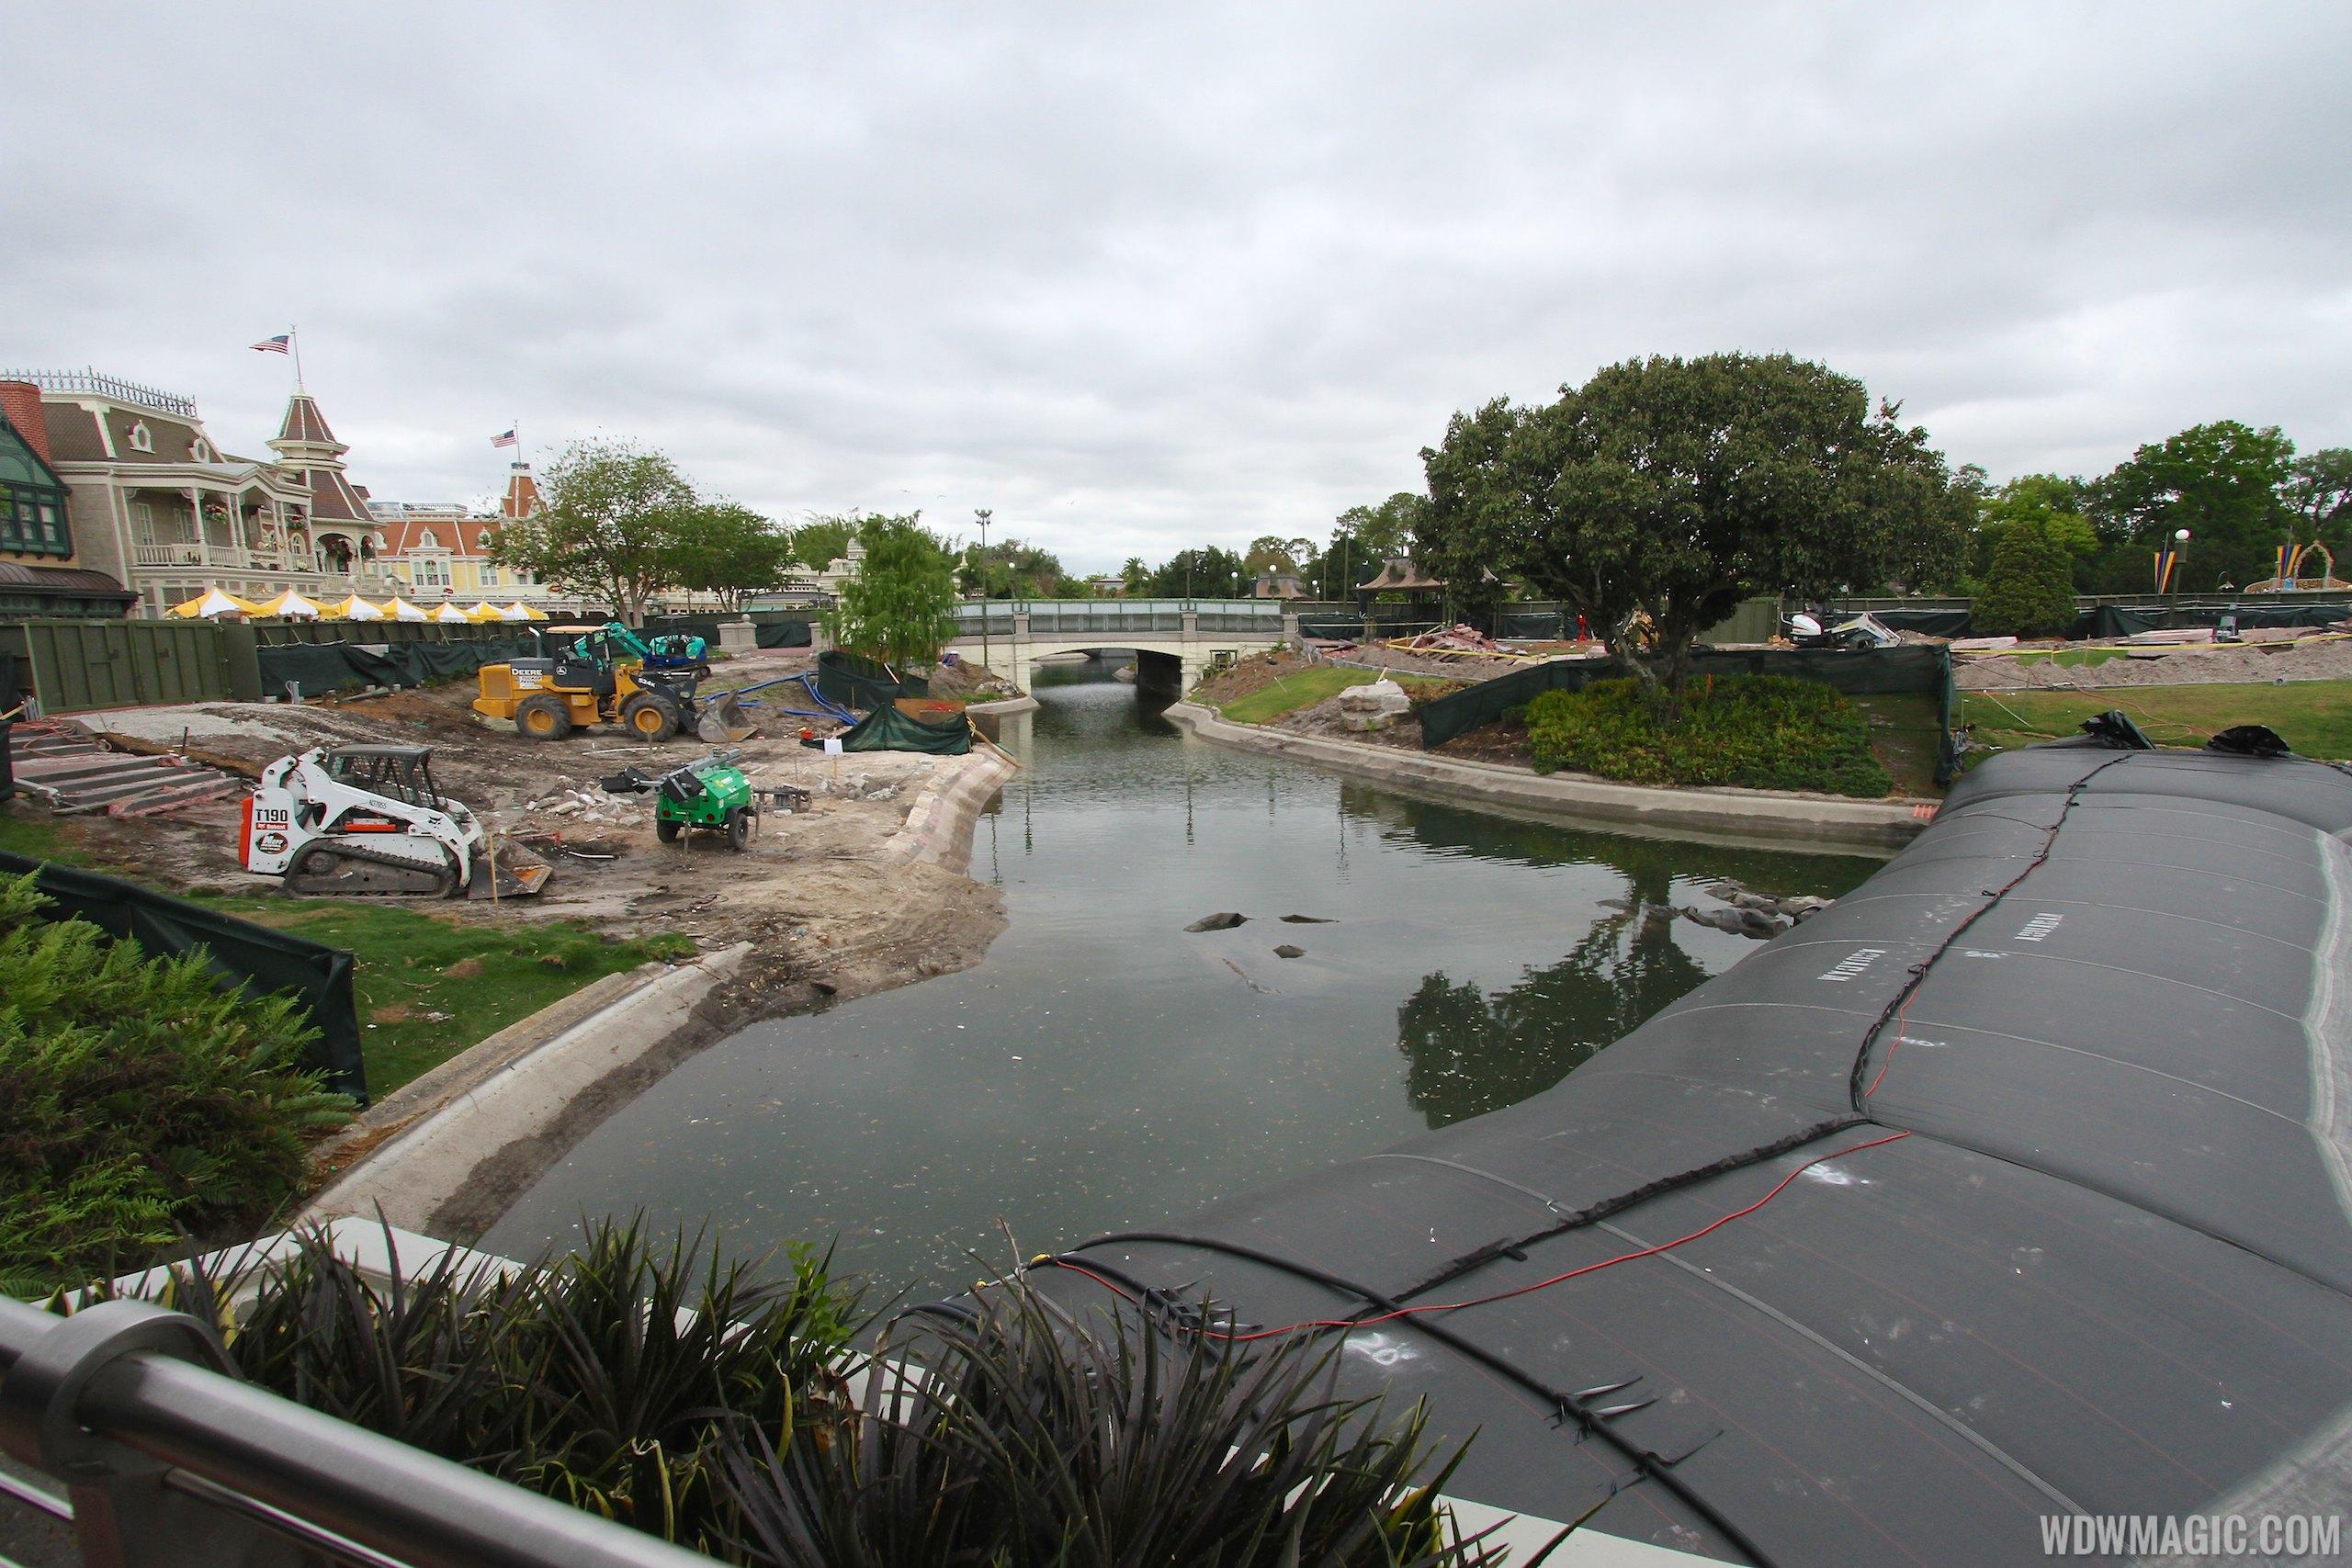 Dams installed on the Magic Kingdom's waterways